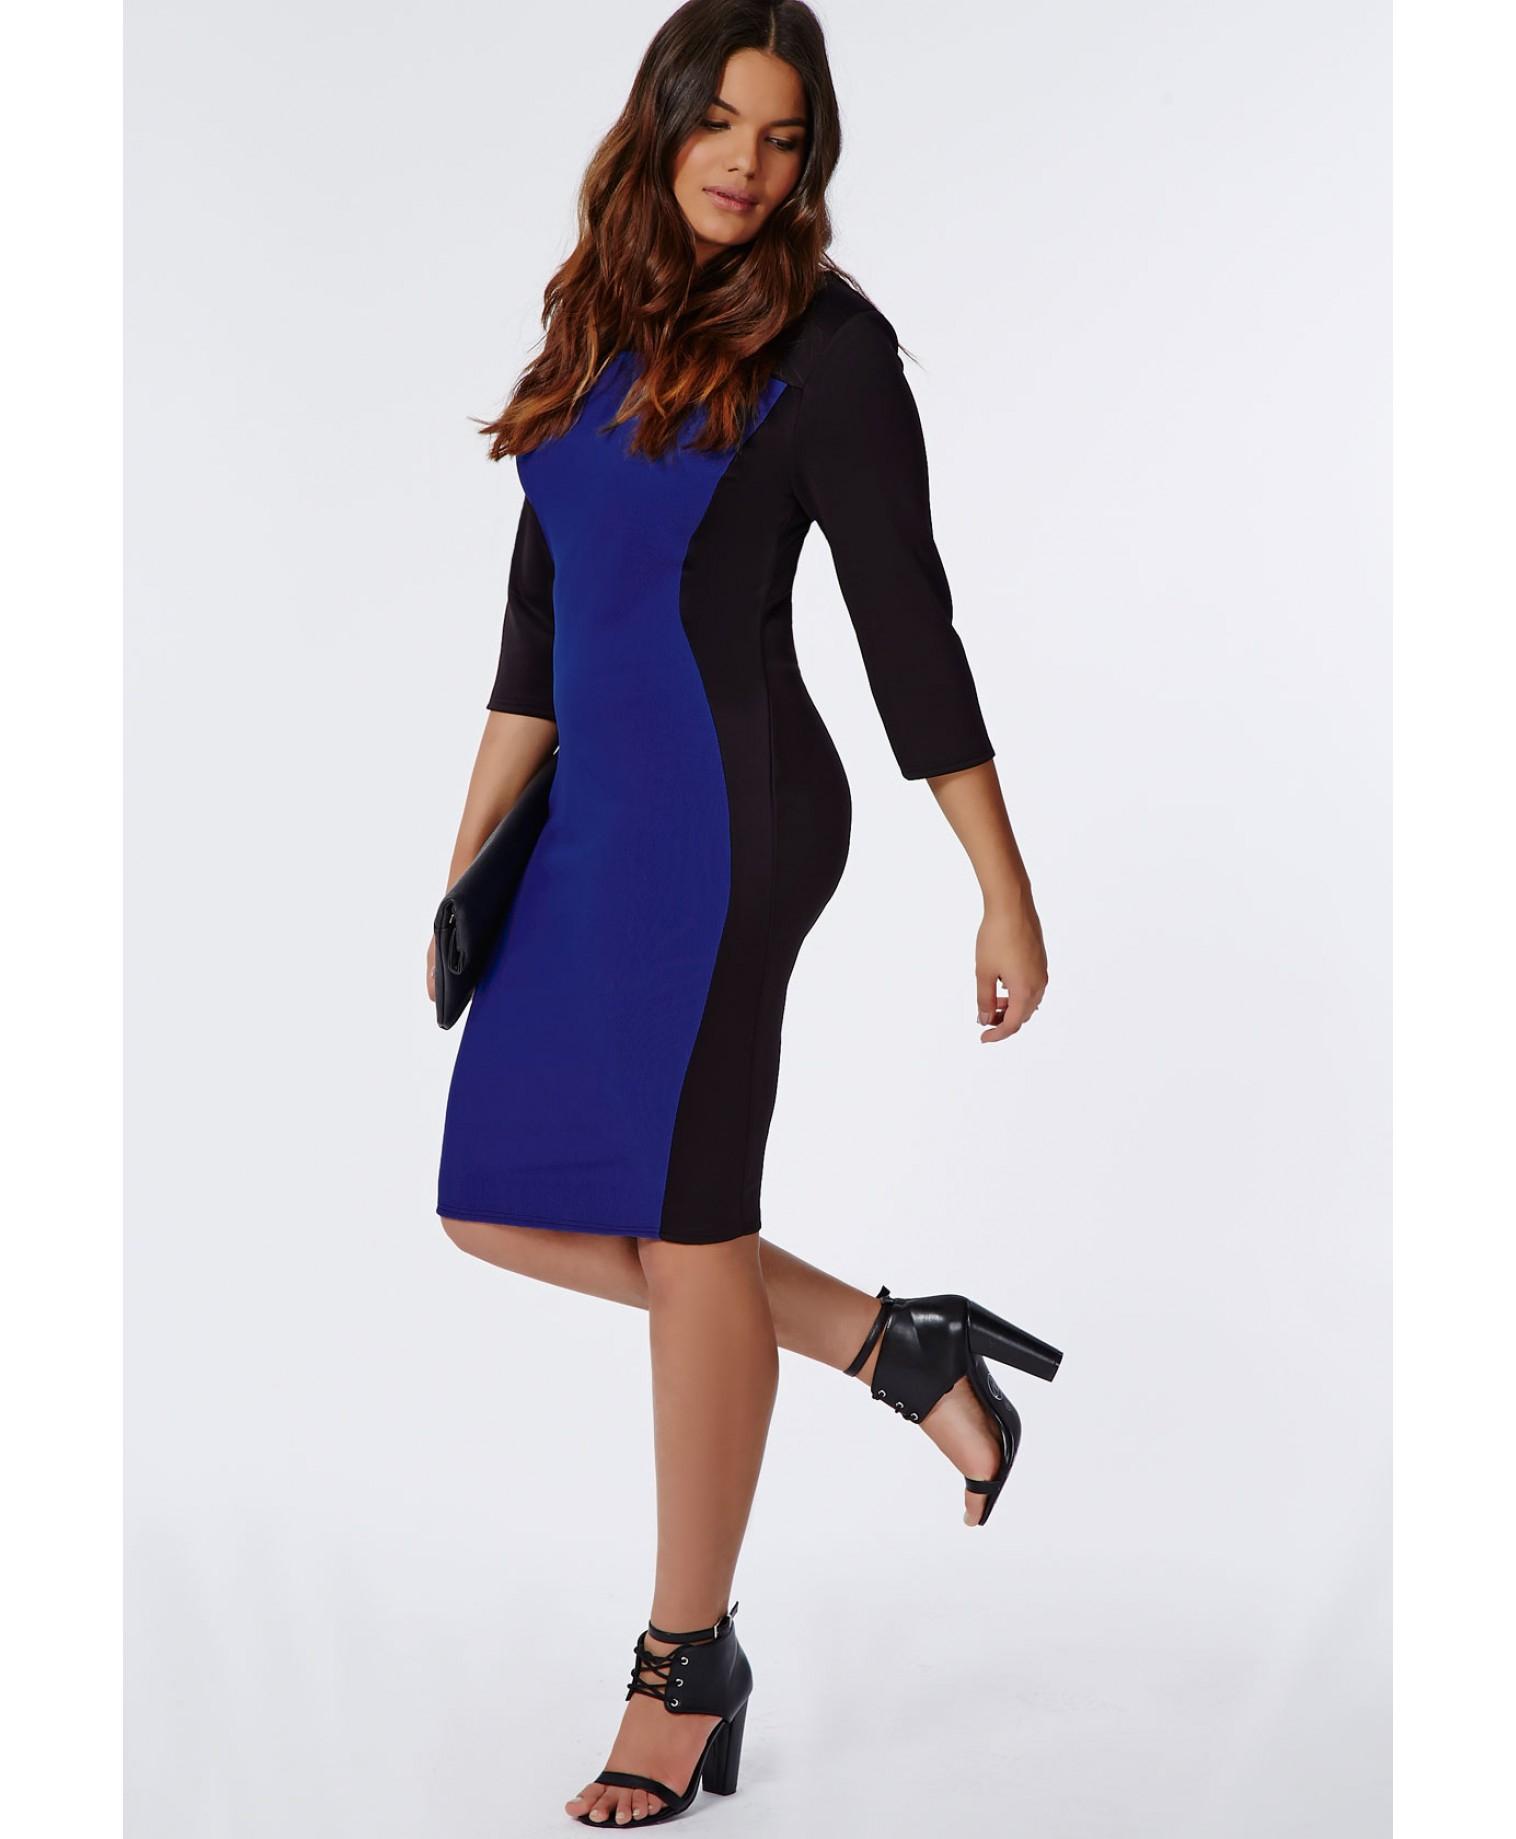 Plus Size Illusion Dress – Fashion dresses